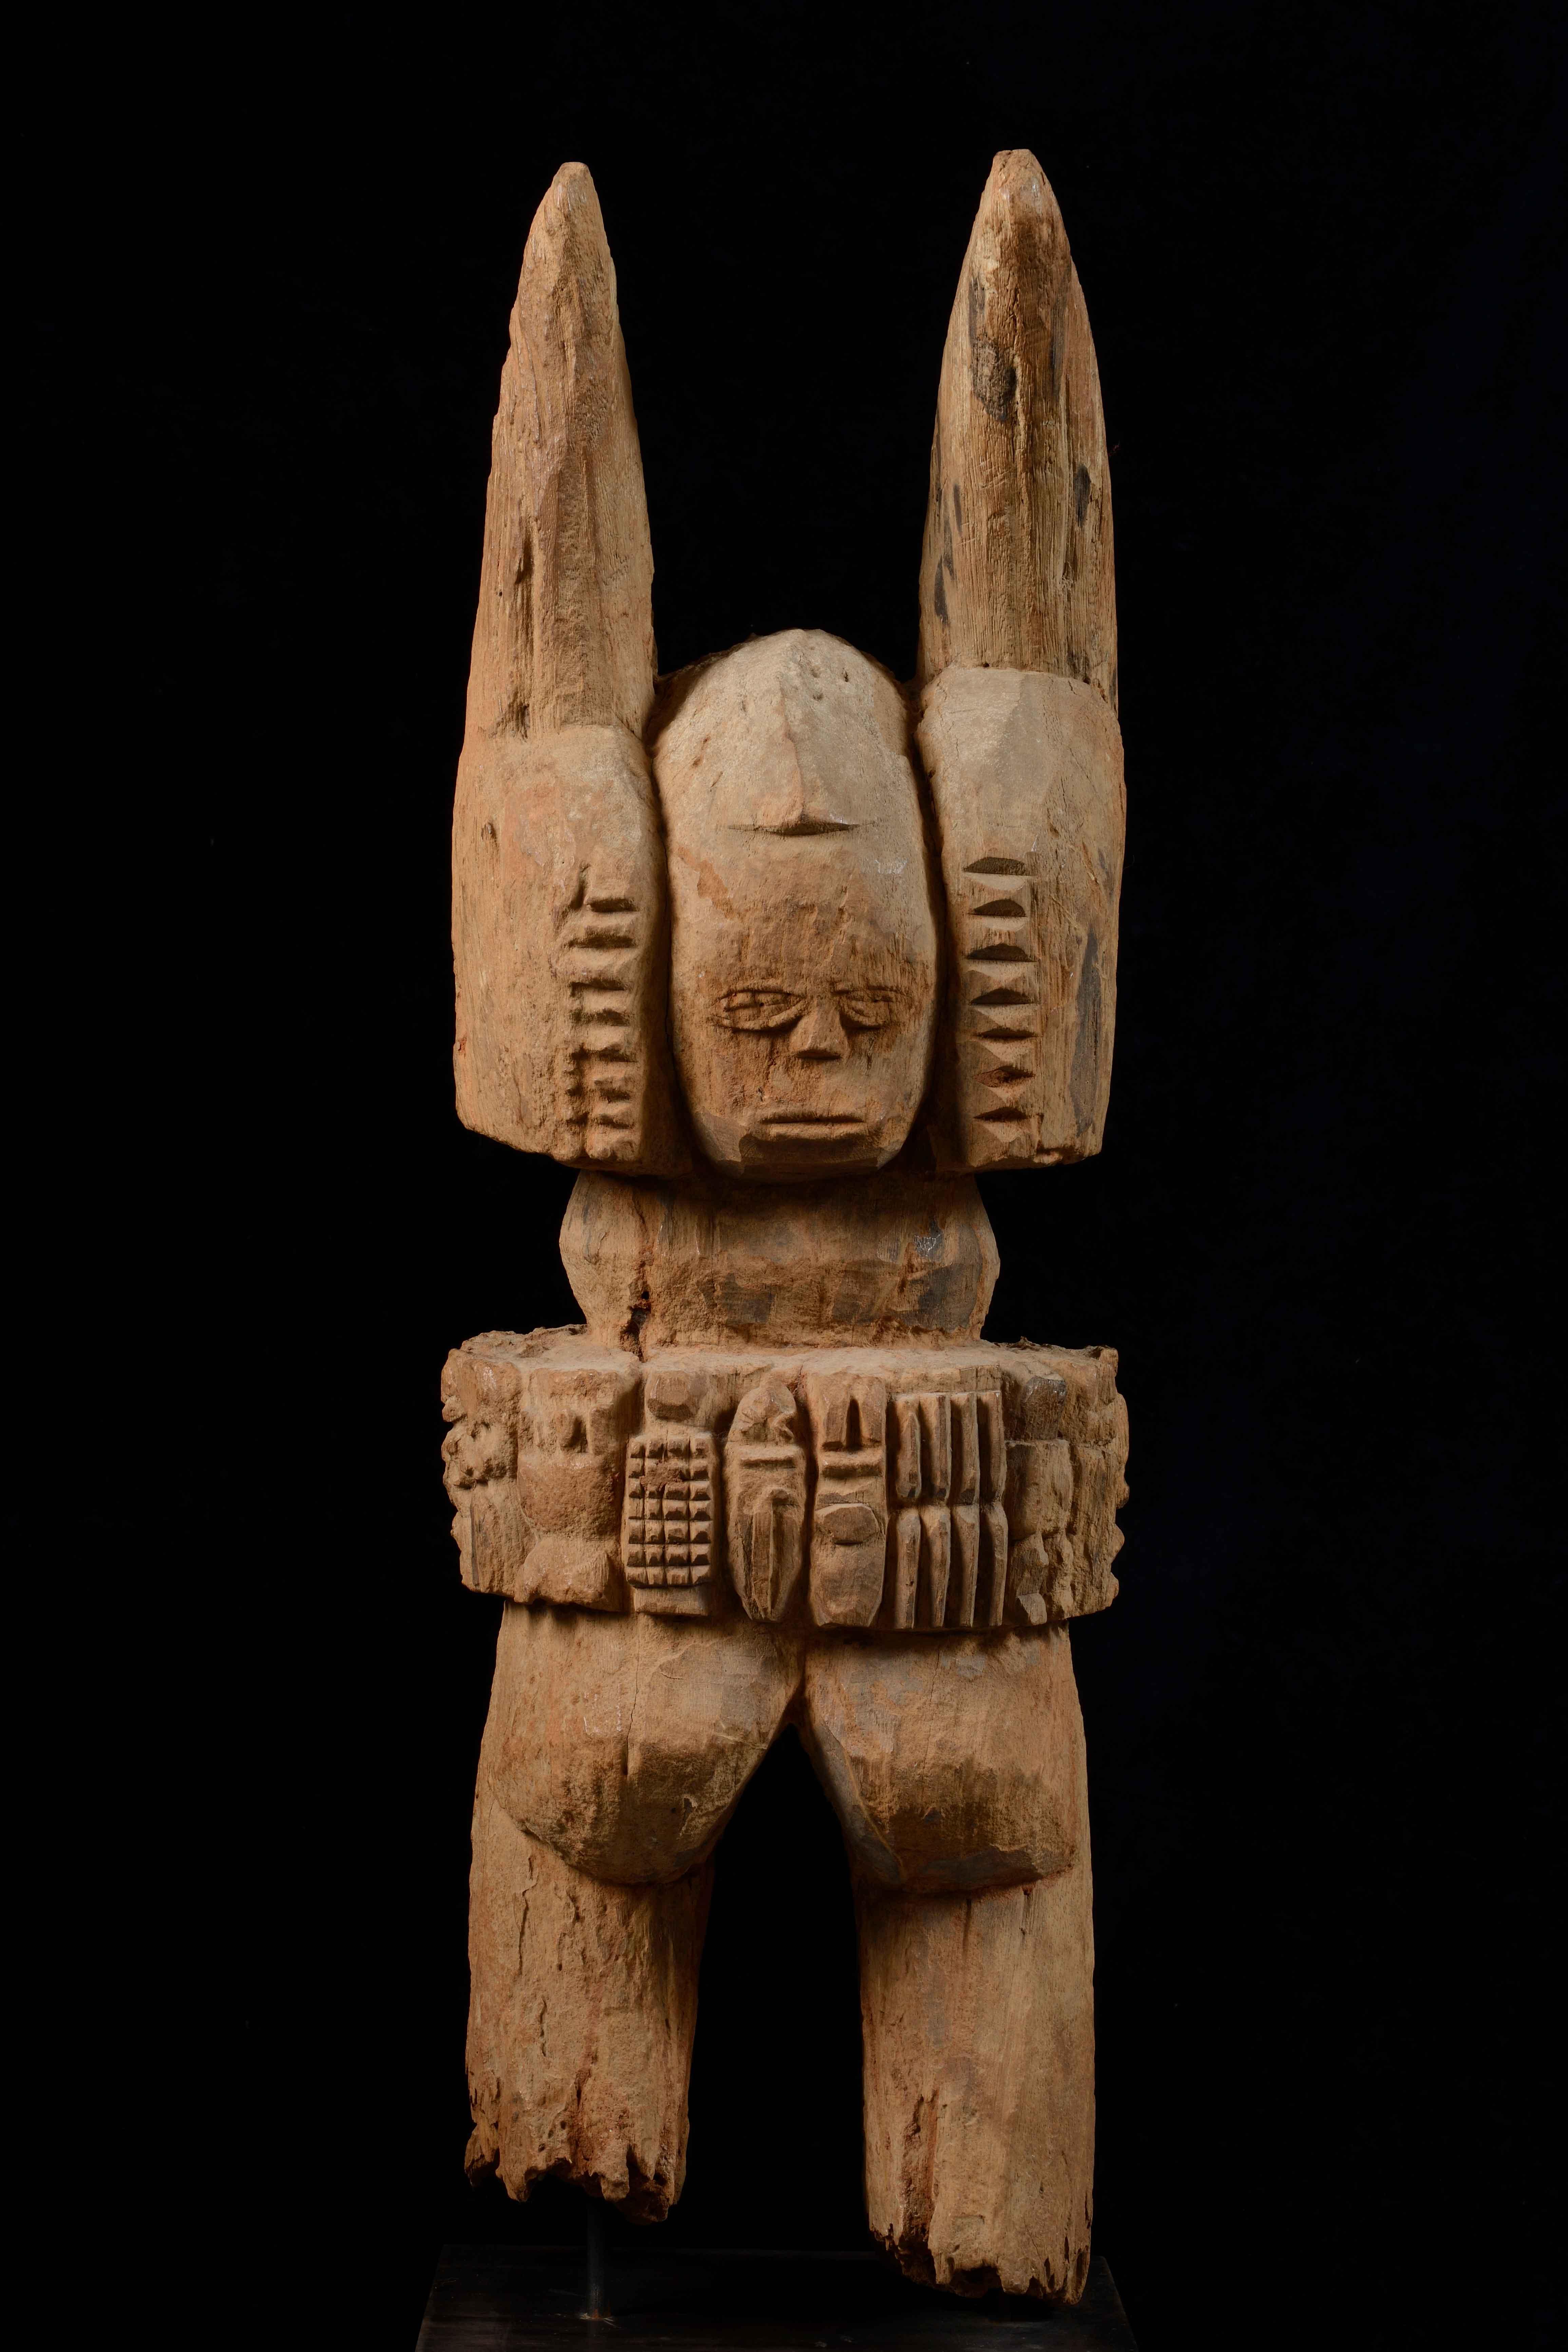 Figura bifronte Ikenga Cultura ibo (Nigeria)